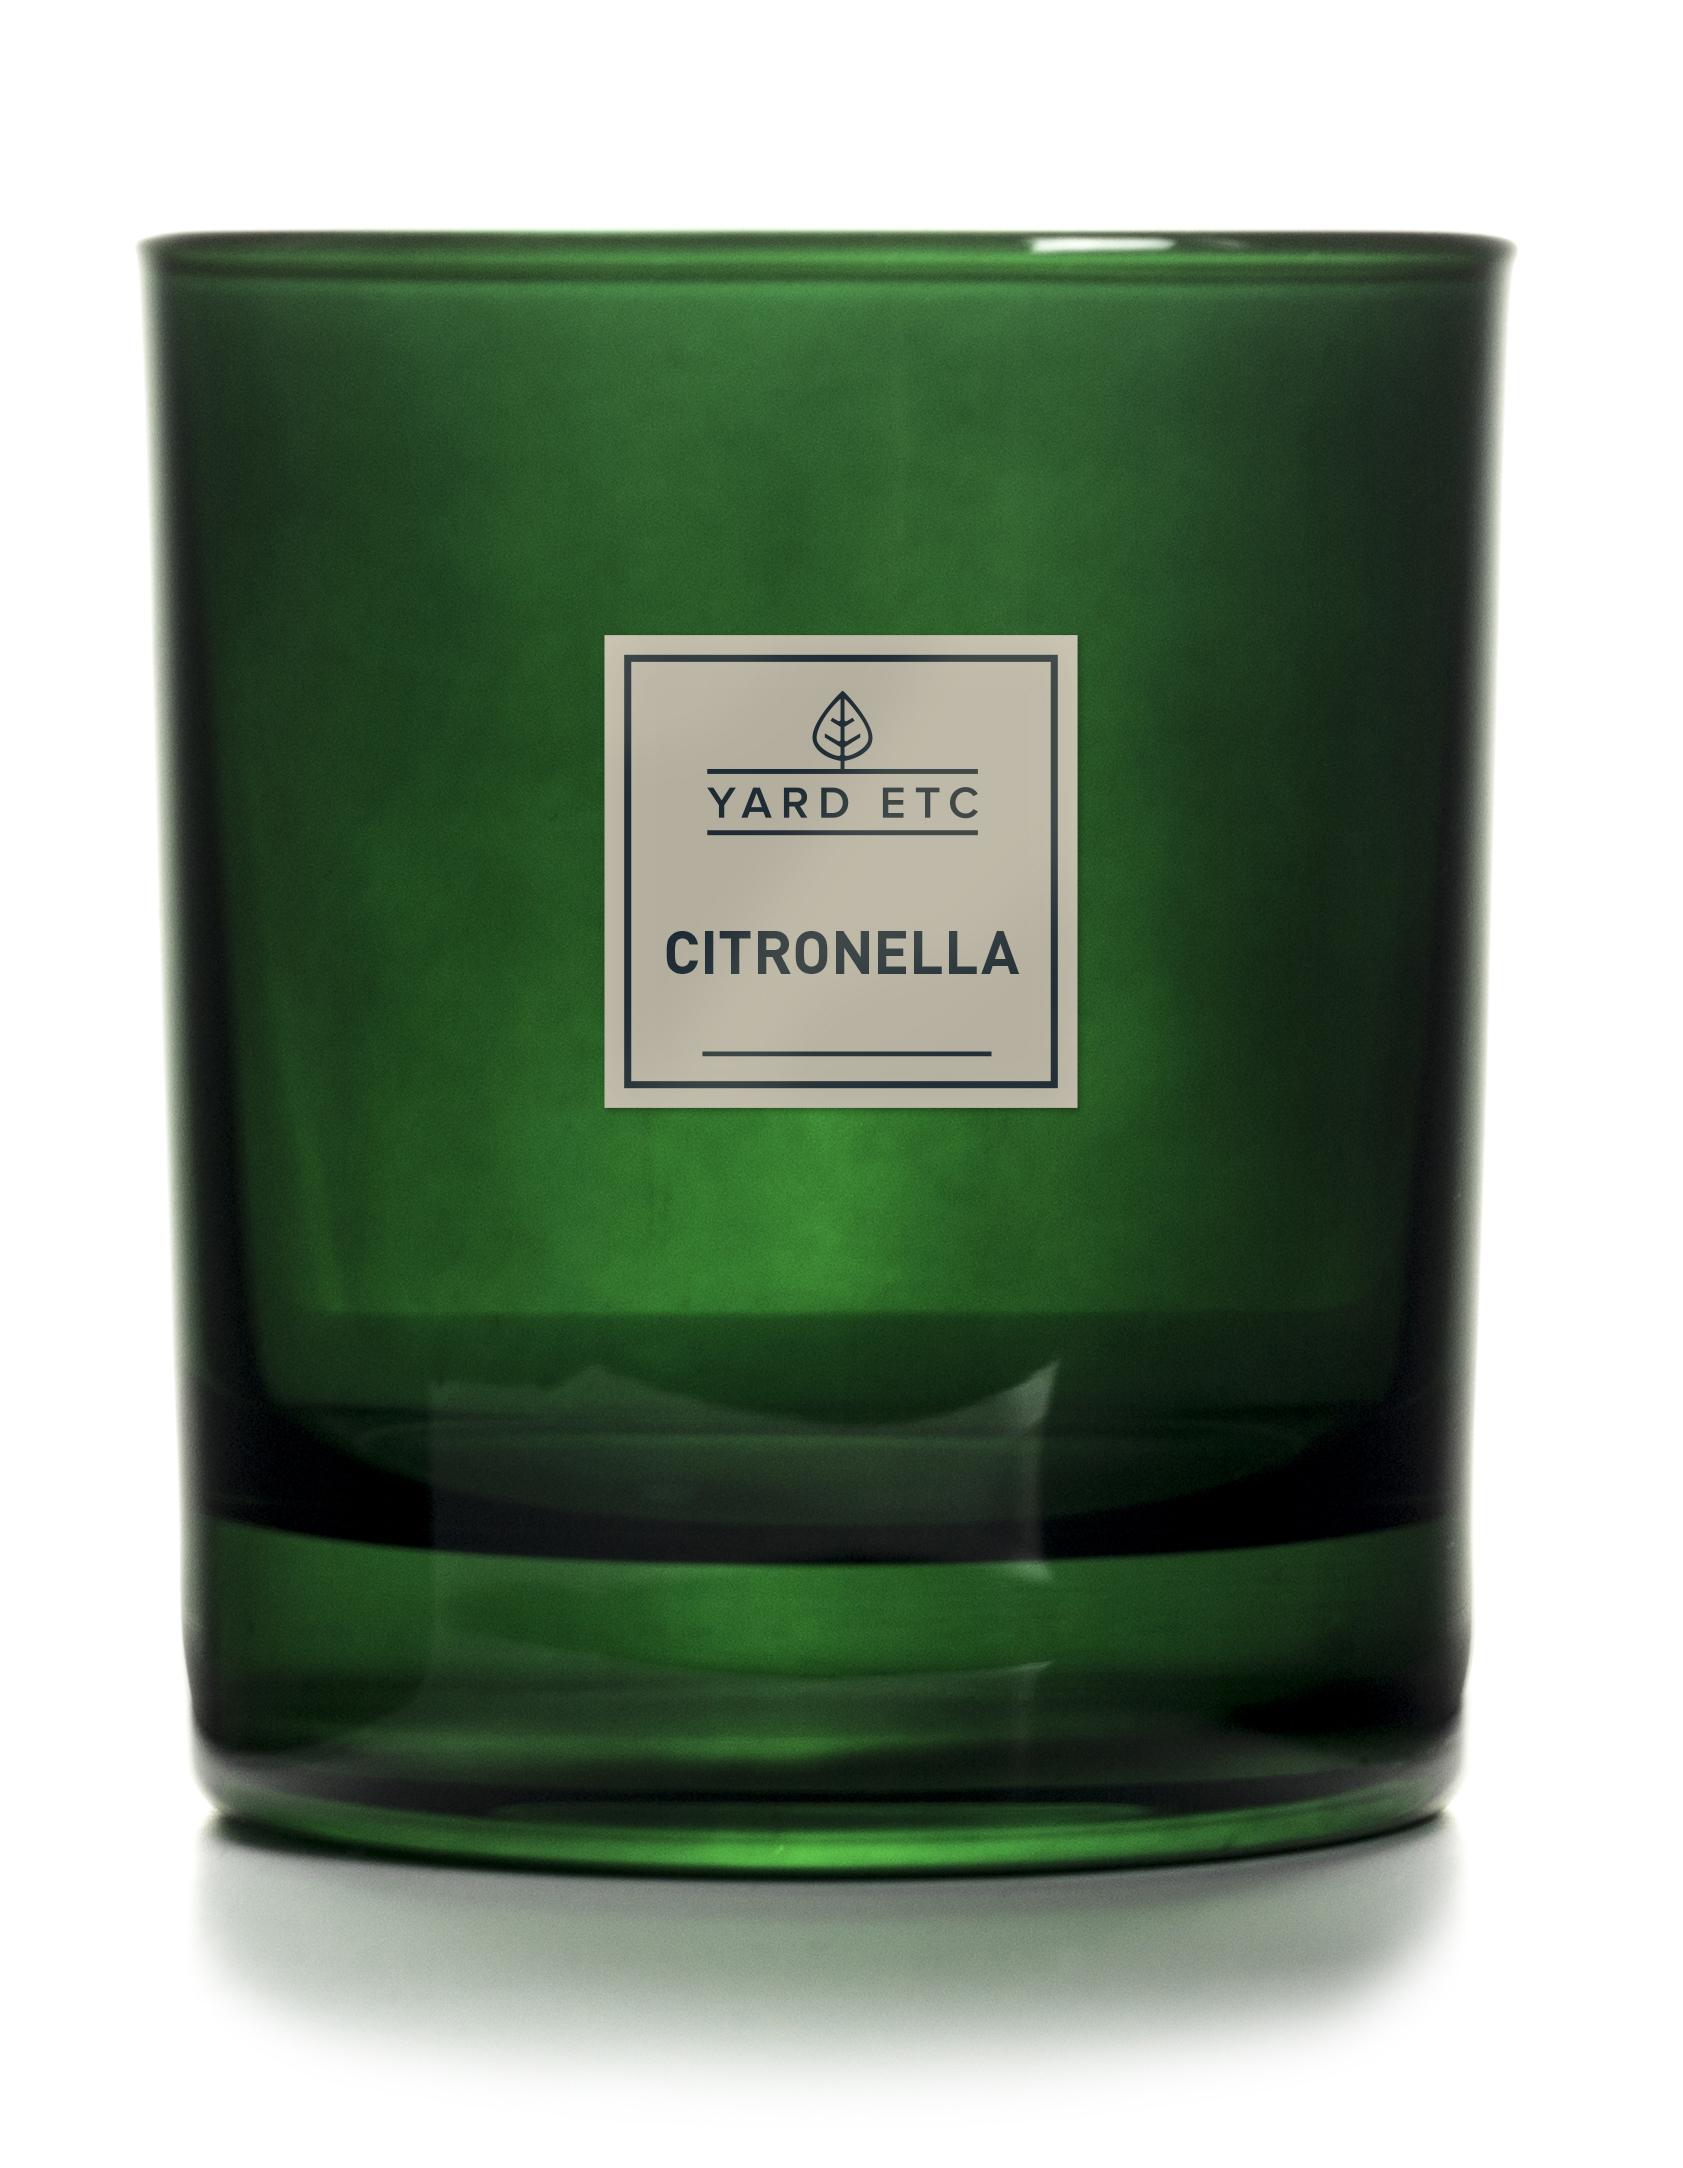 YARD-ETC-scented-candle-citronella (002)